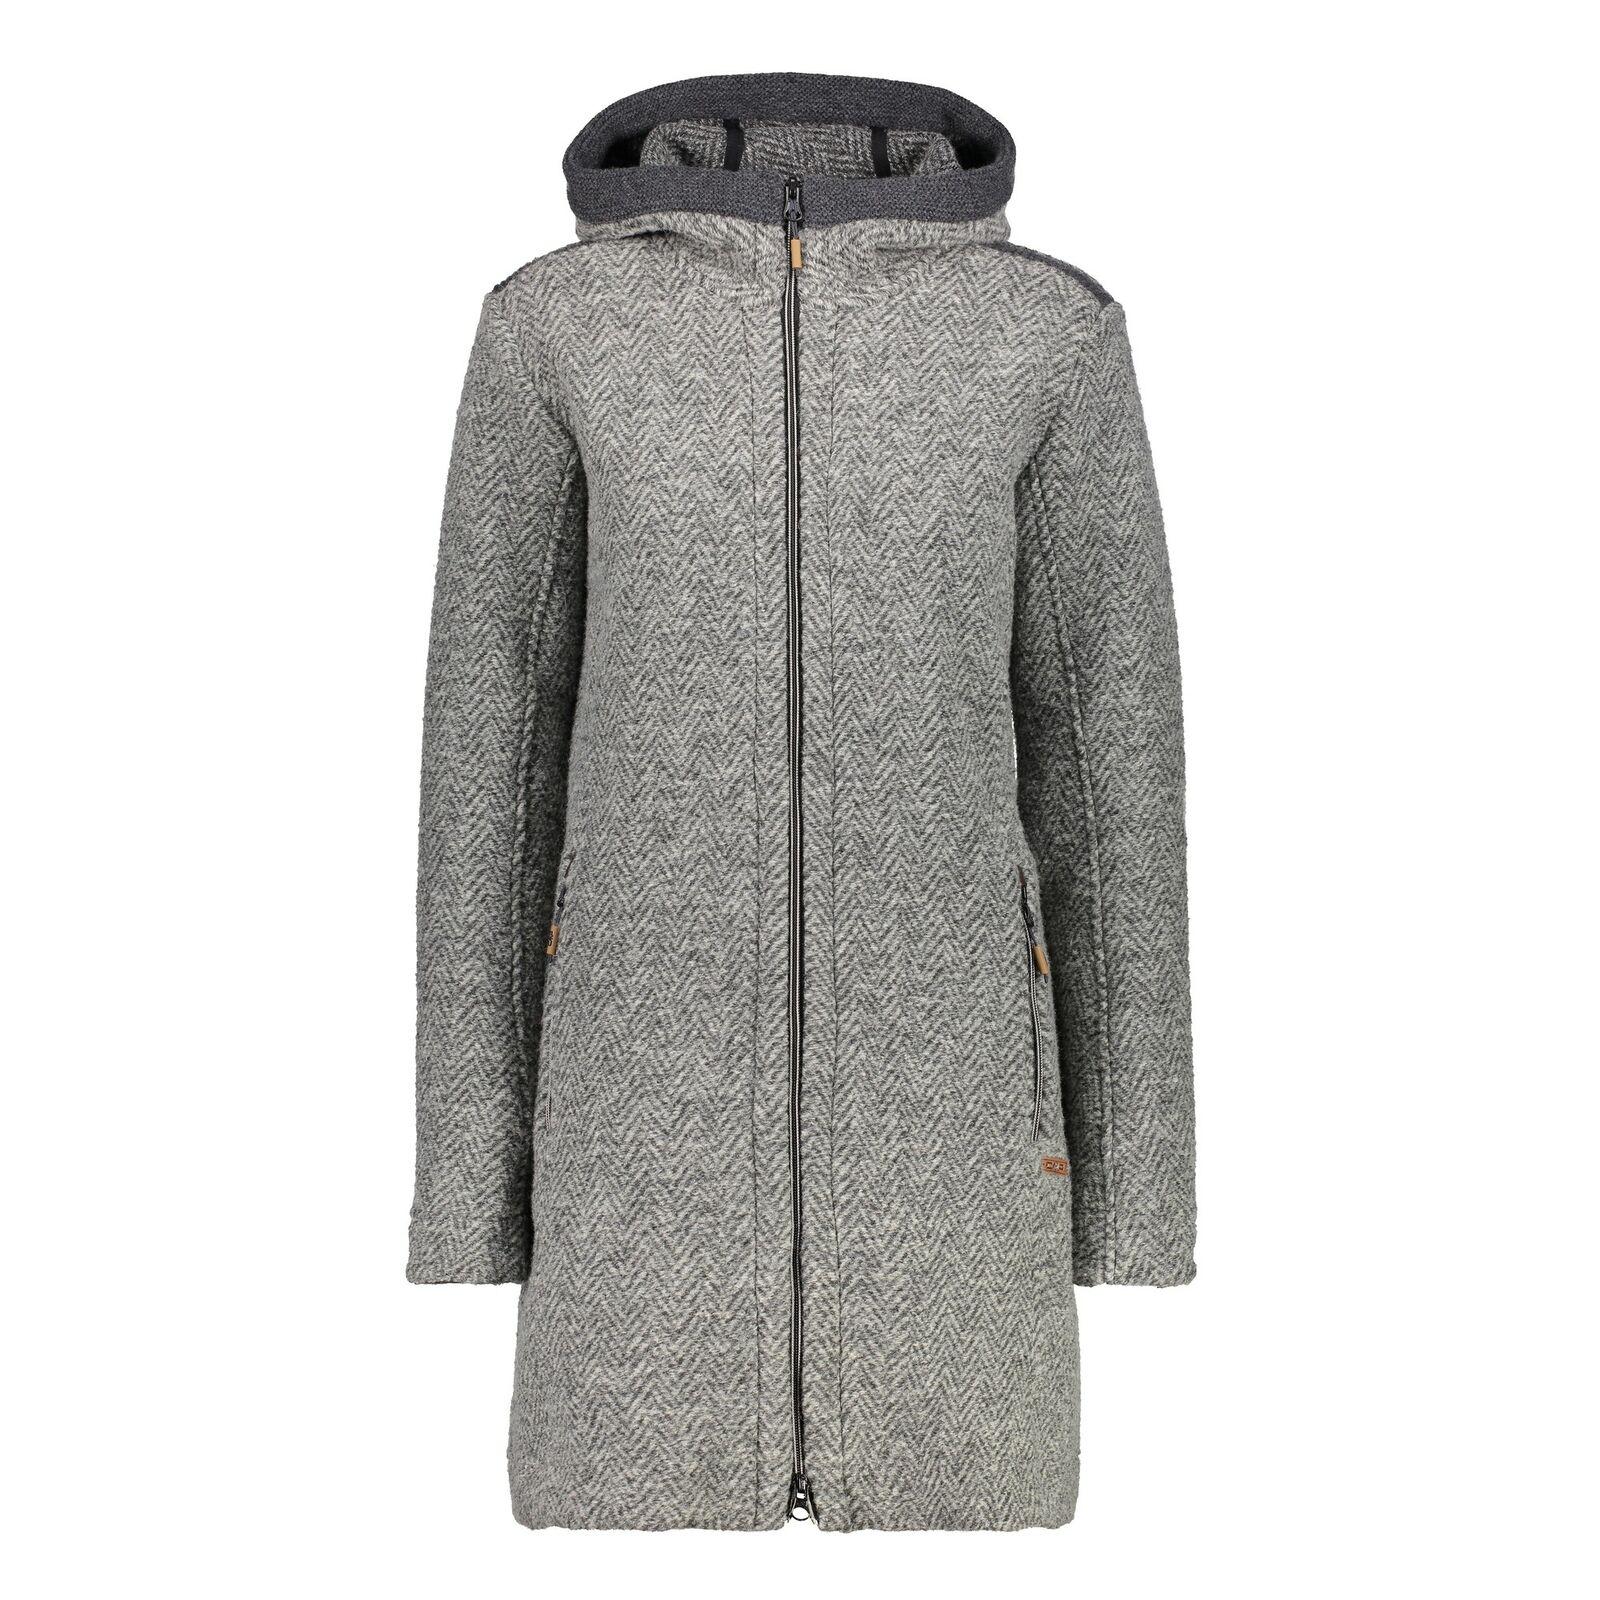 CMP Funktionsjacke Jacke WOMAN COAT FIX HOOD grau atmungsaktiv Wolle